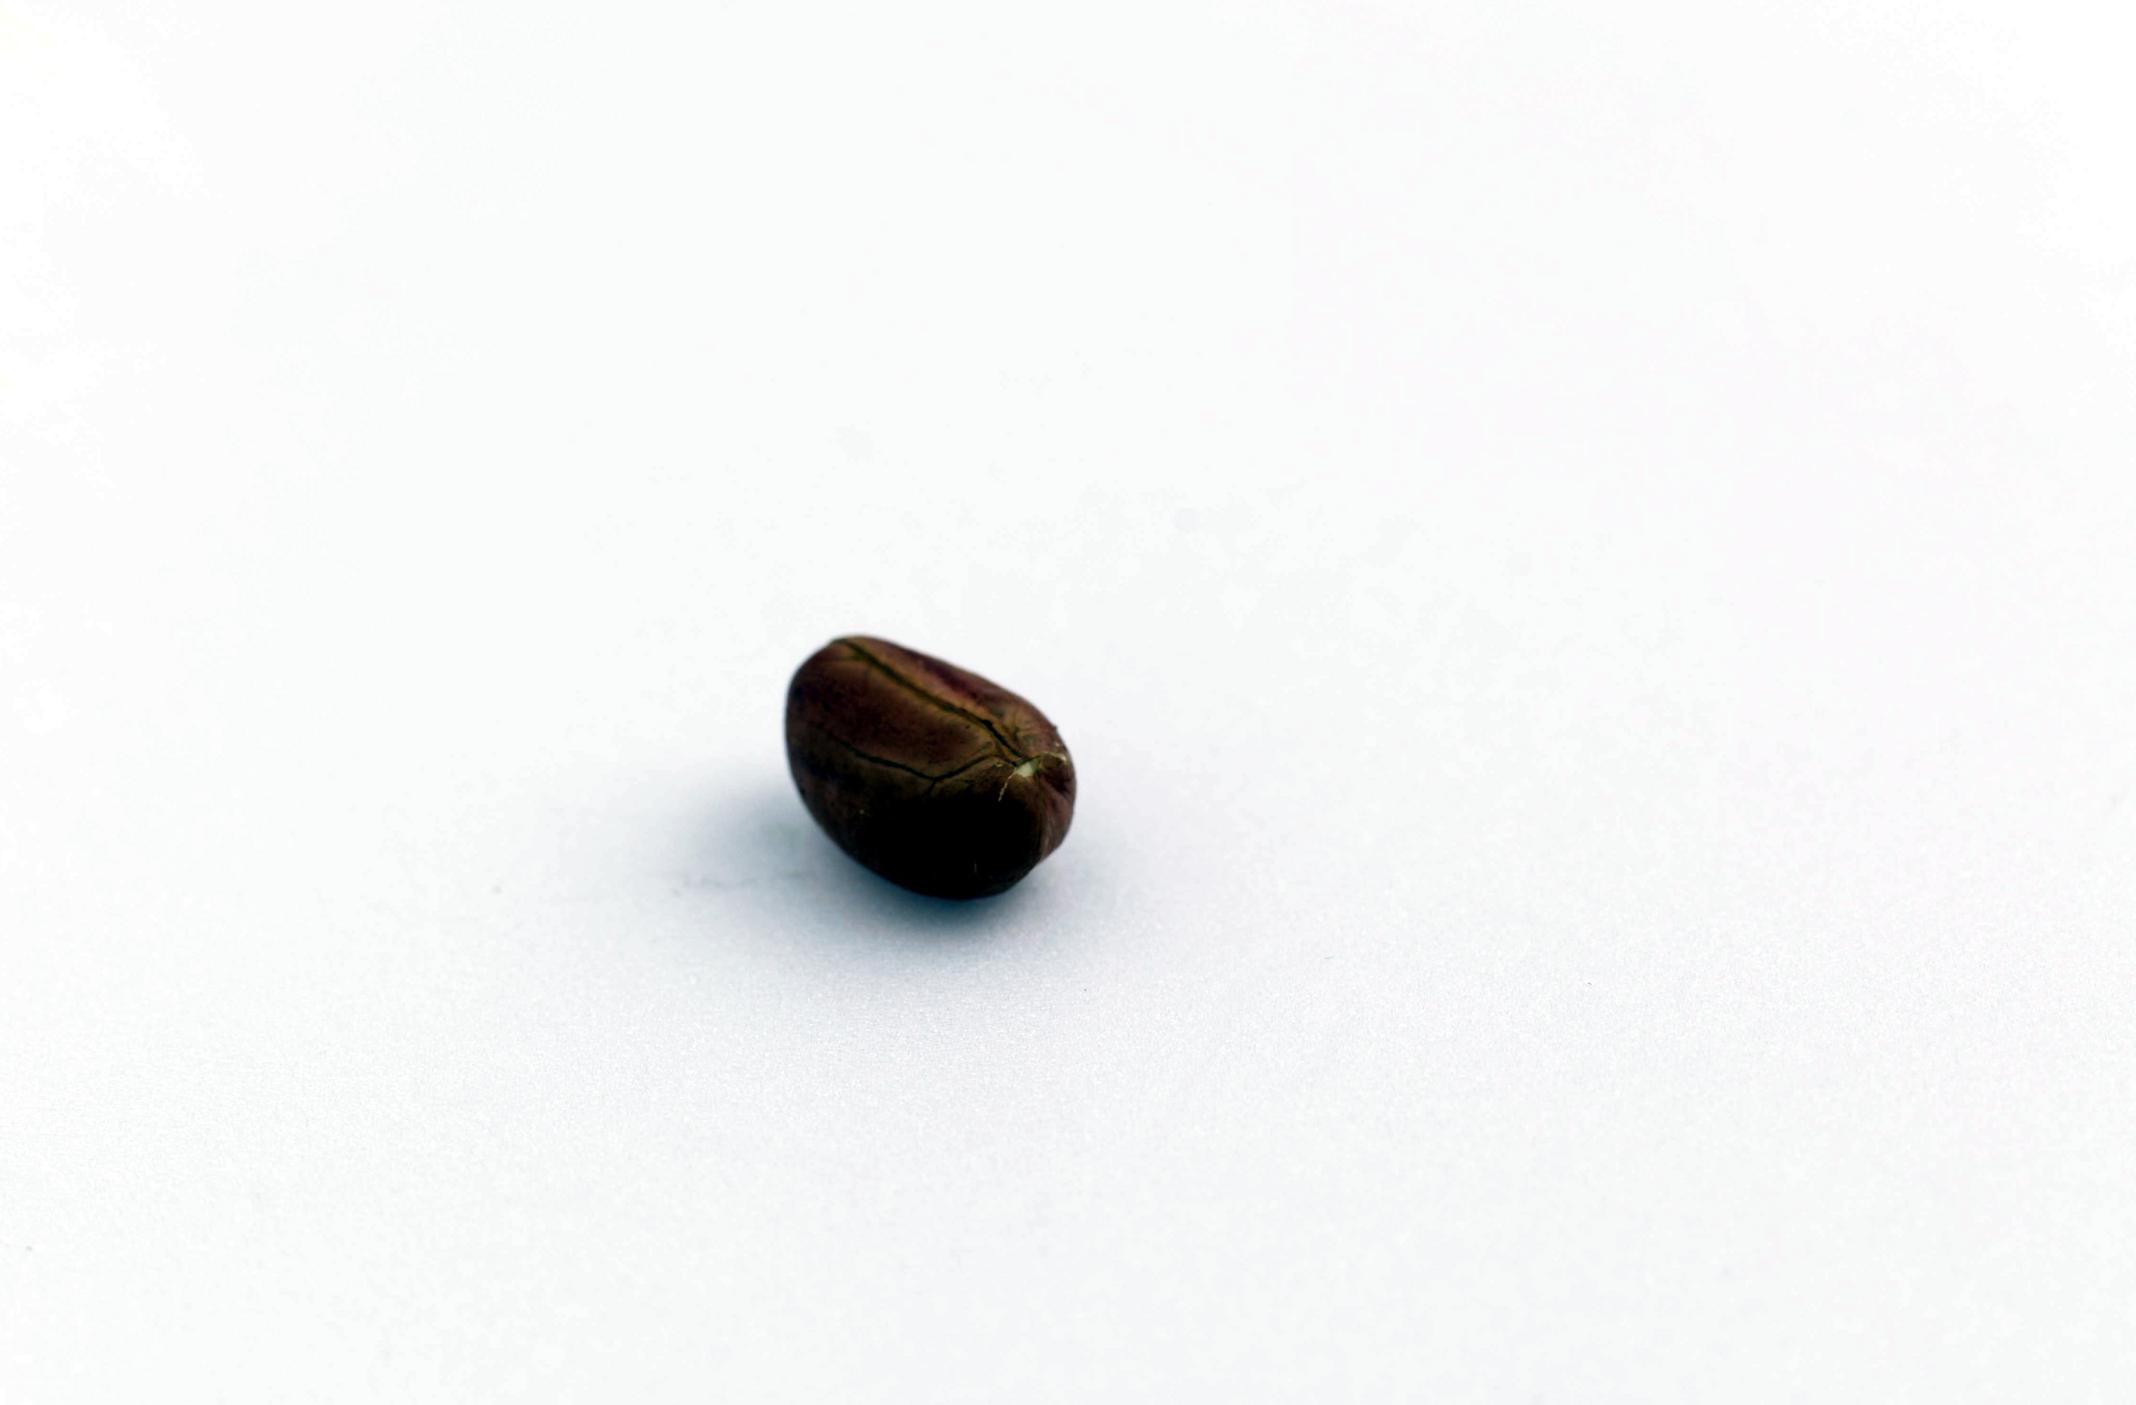 Three Main Parts Of A Seed